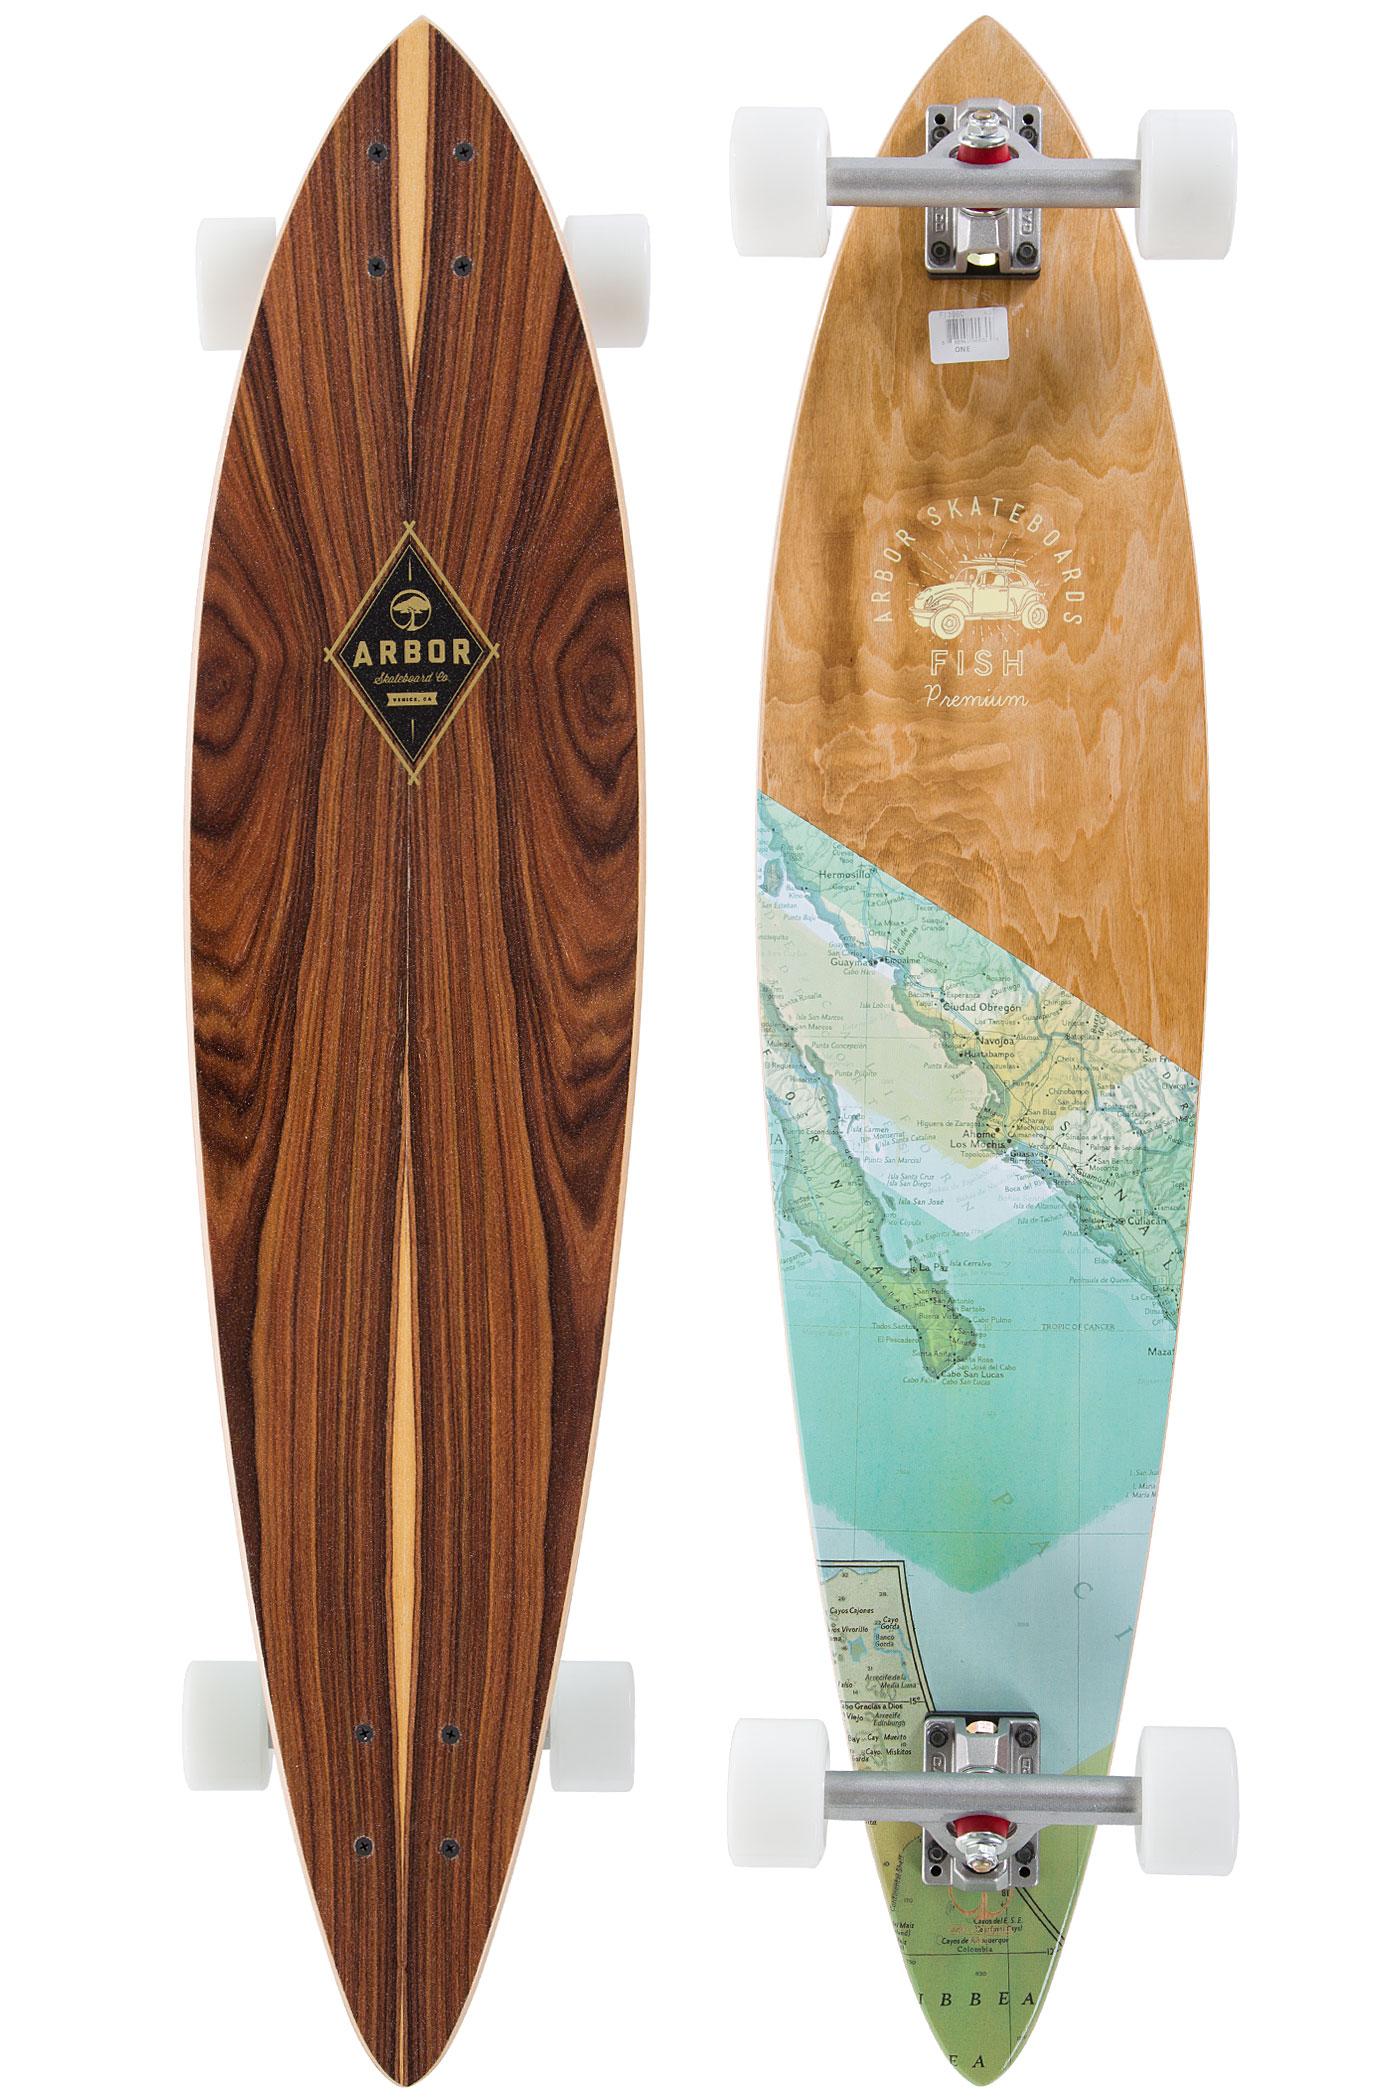 Arbor fish premium 39 99cm complete longboard 2016 koop for Arbor fish longboard